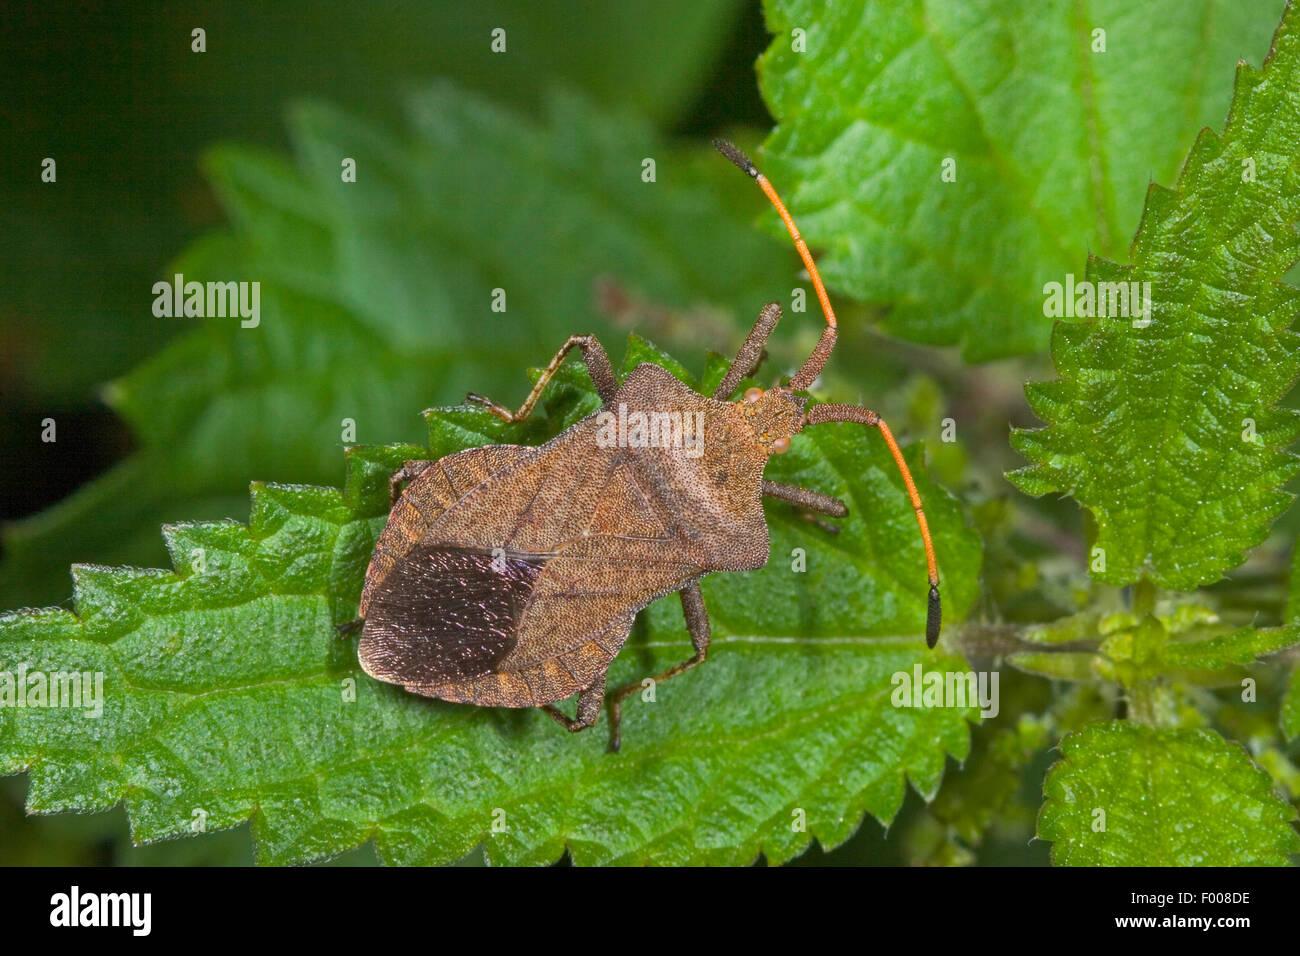 Squash bug (Coreus marginatus, Mesocerus marginatus), sentada sobre una hoja, Alemania Imagen De Stock